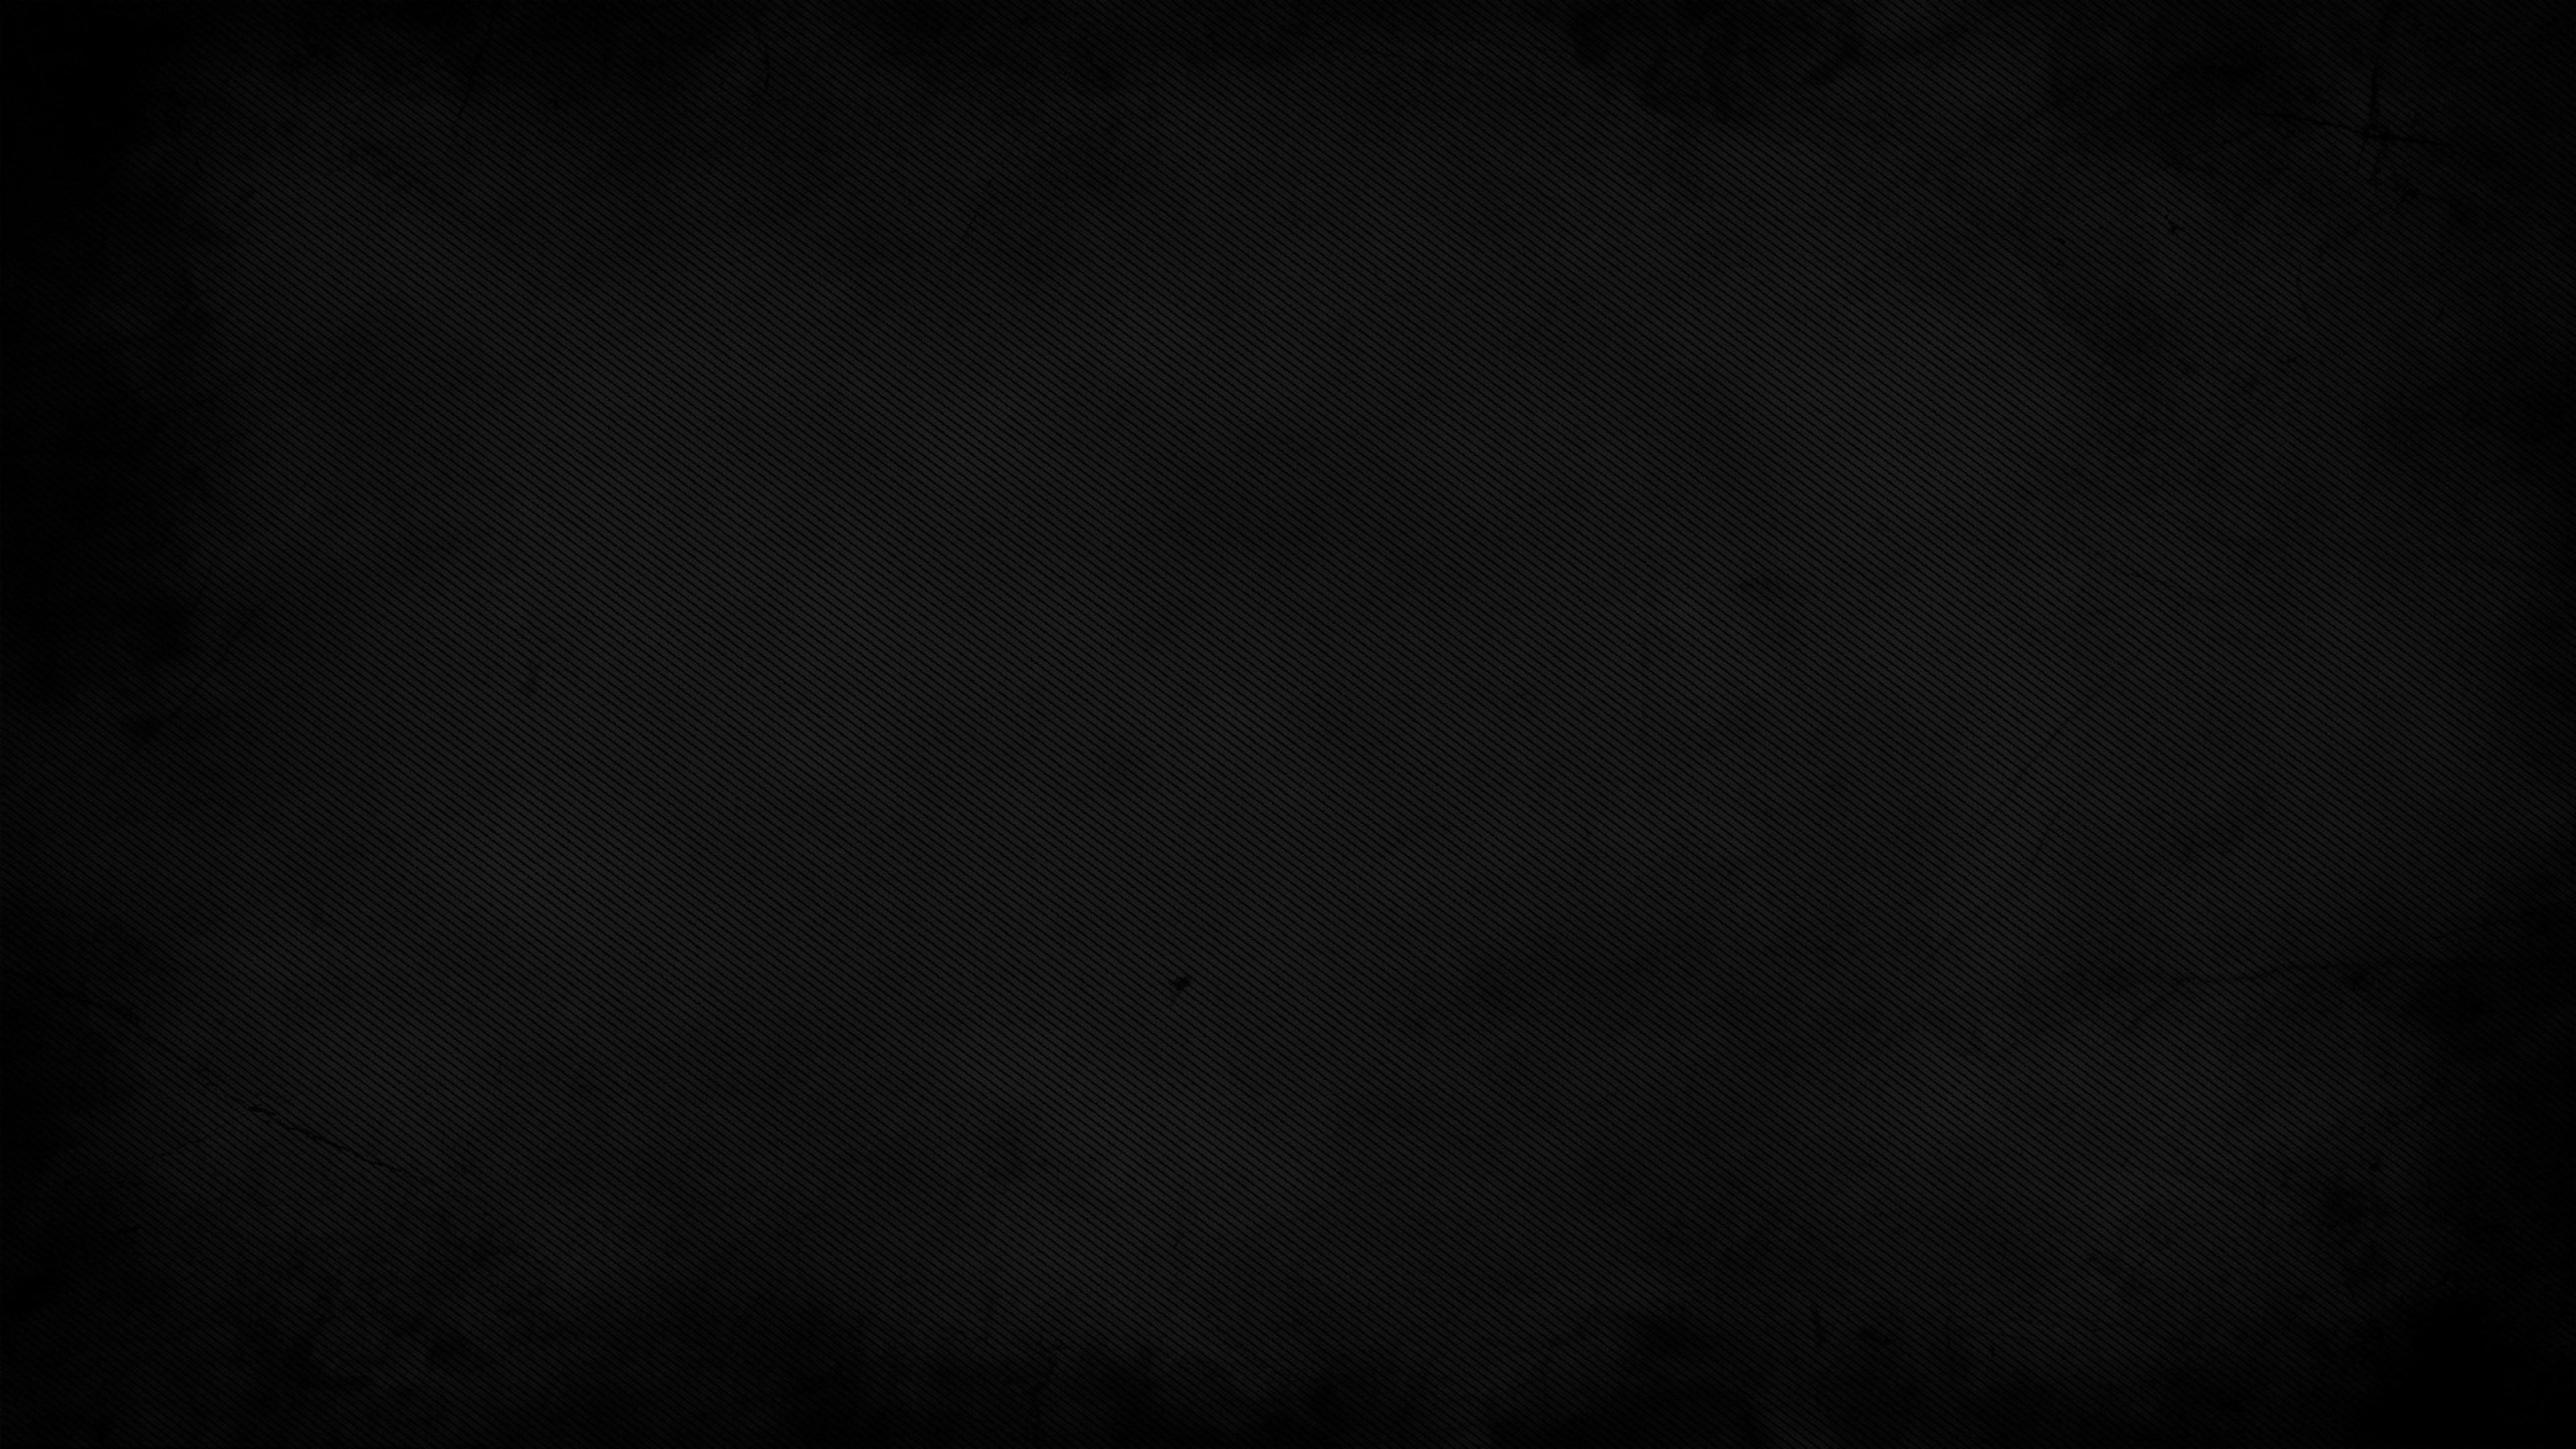 Obliquely Background Band Black Wallpaper Background 4K Ultra HD 3840x2160